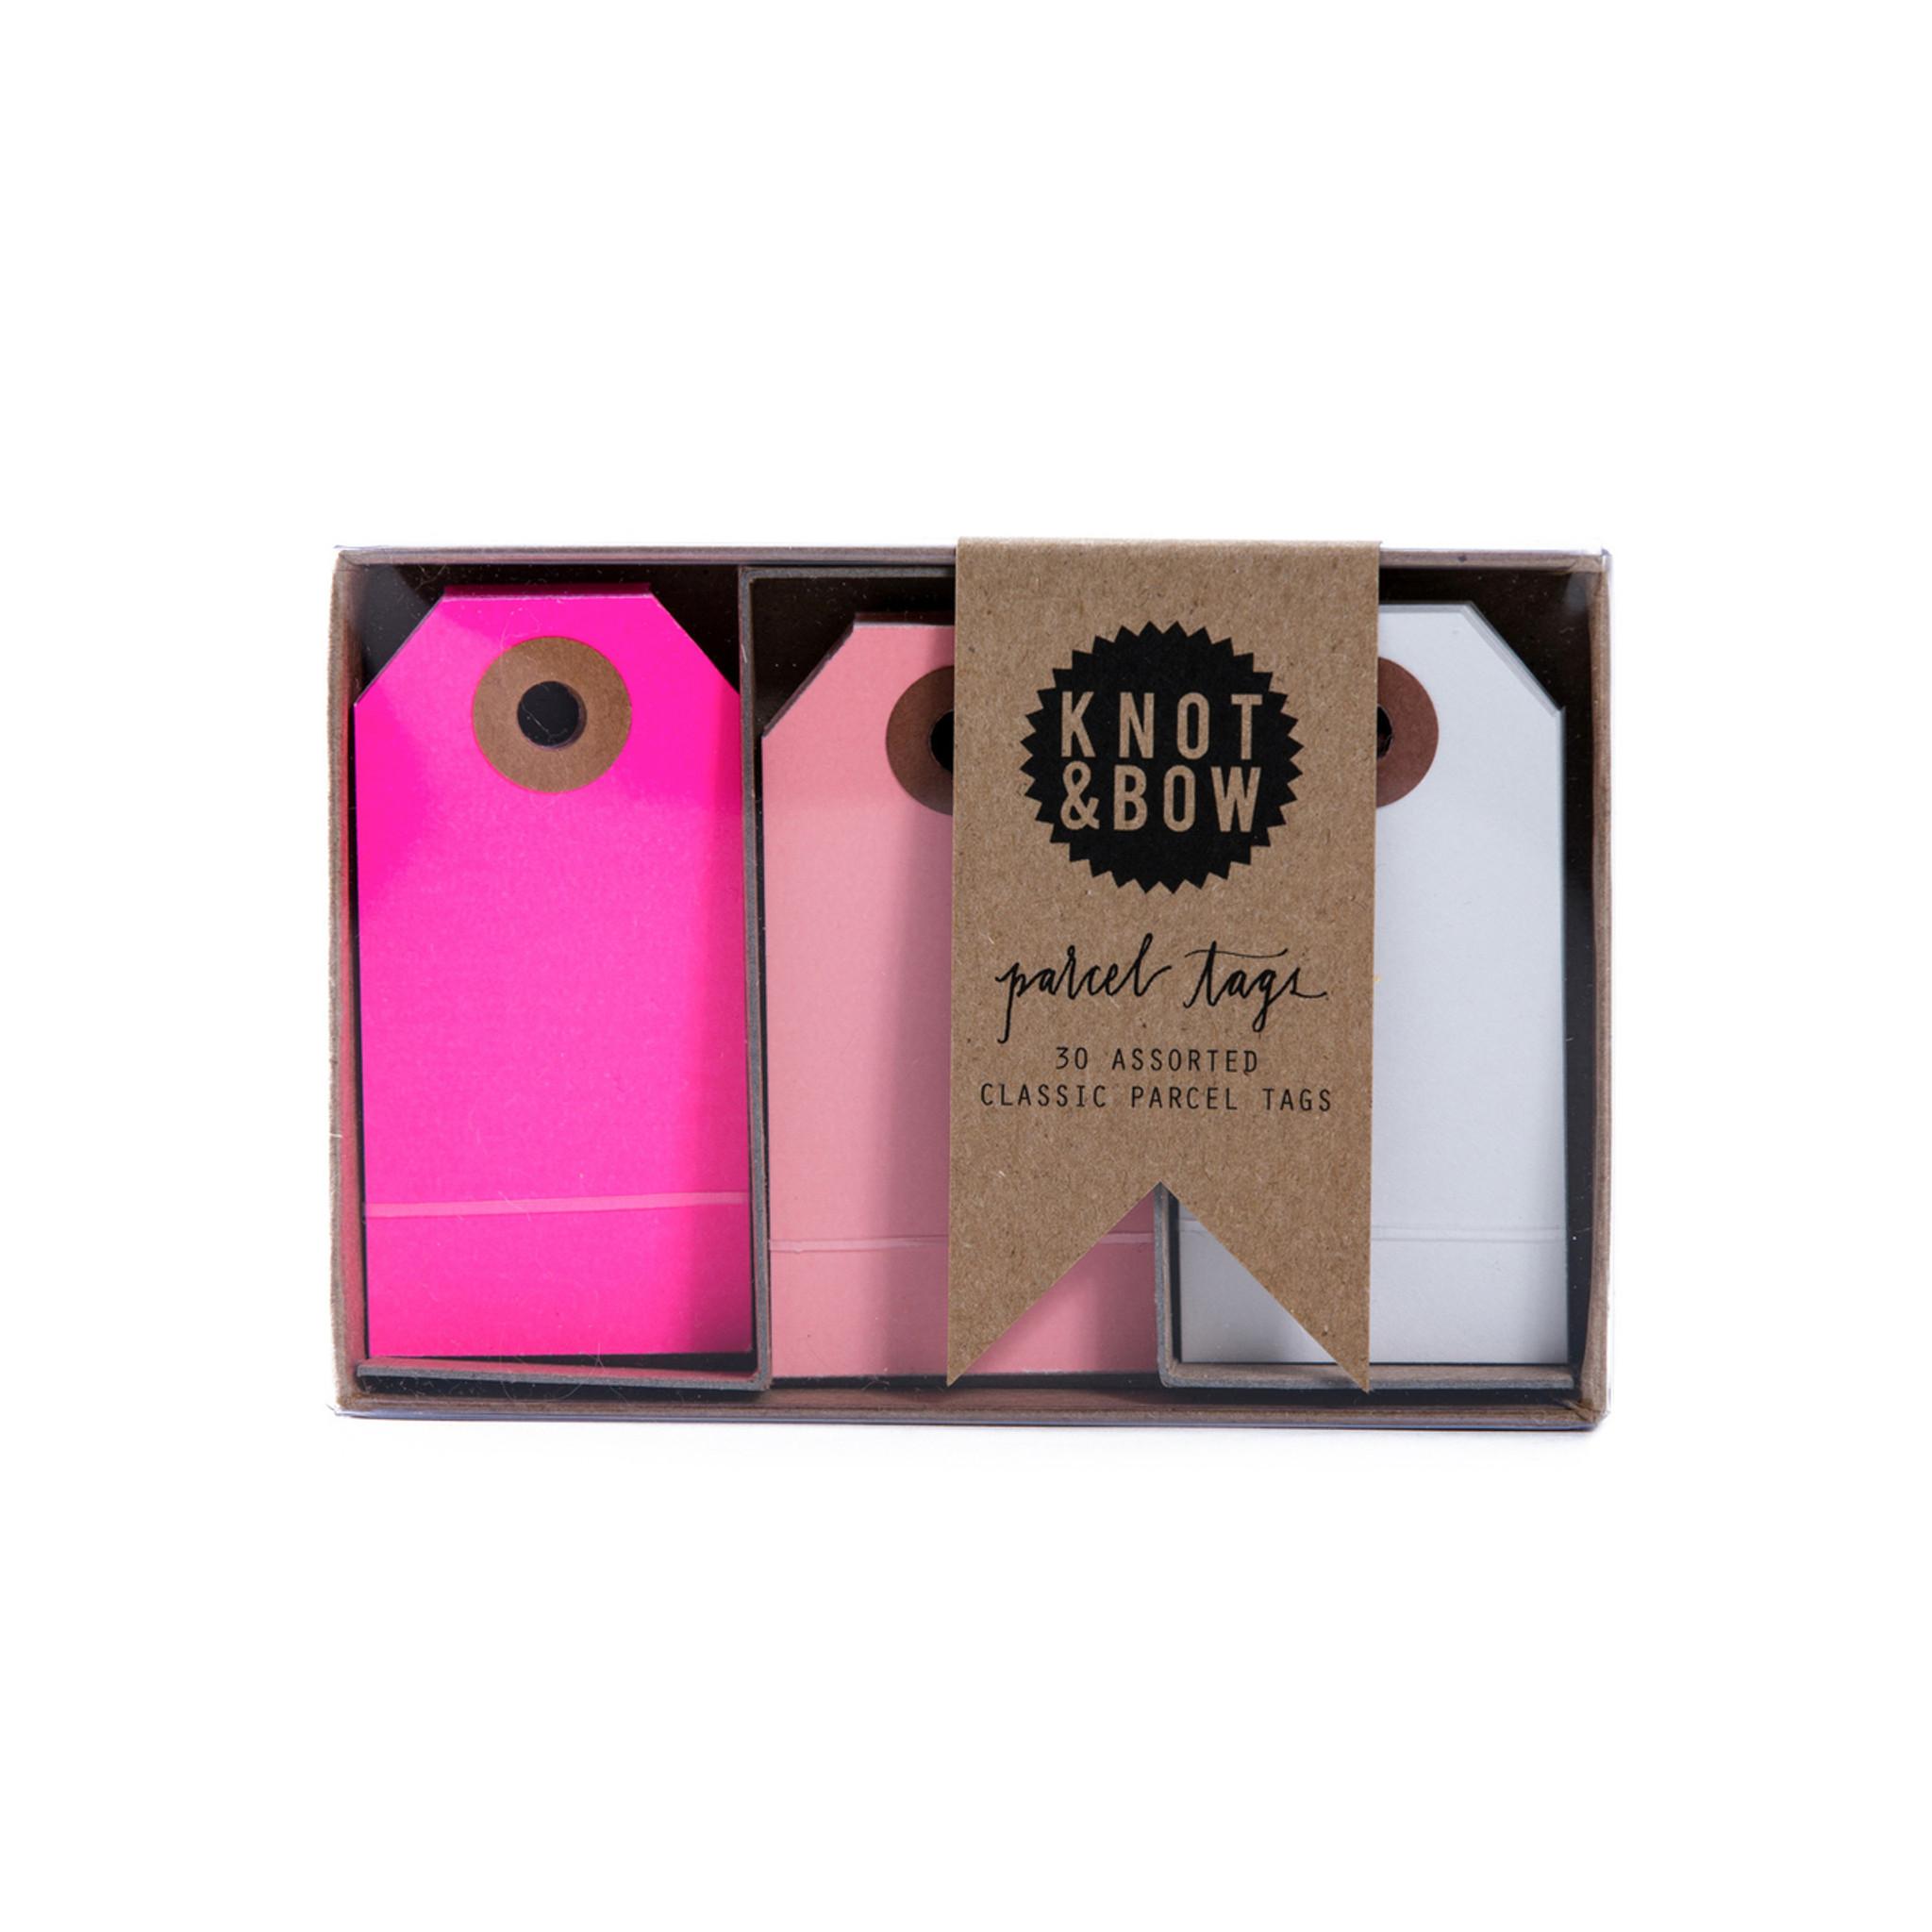 Parcel Tag Trio Box, Pink Mix